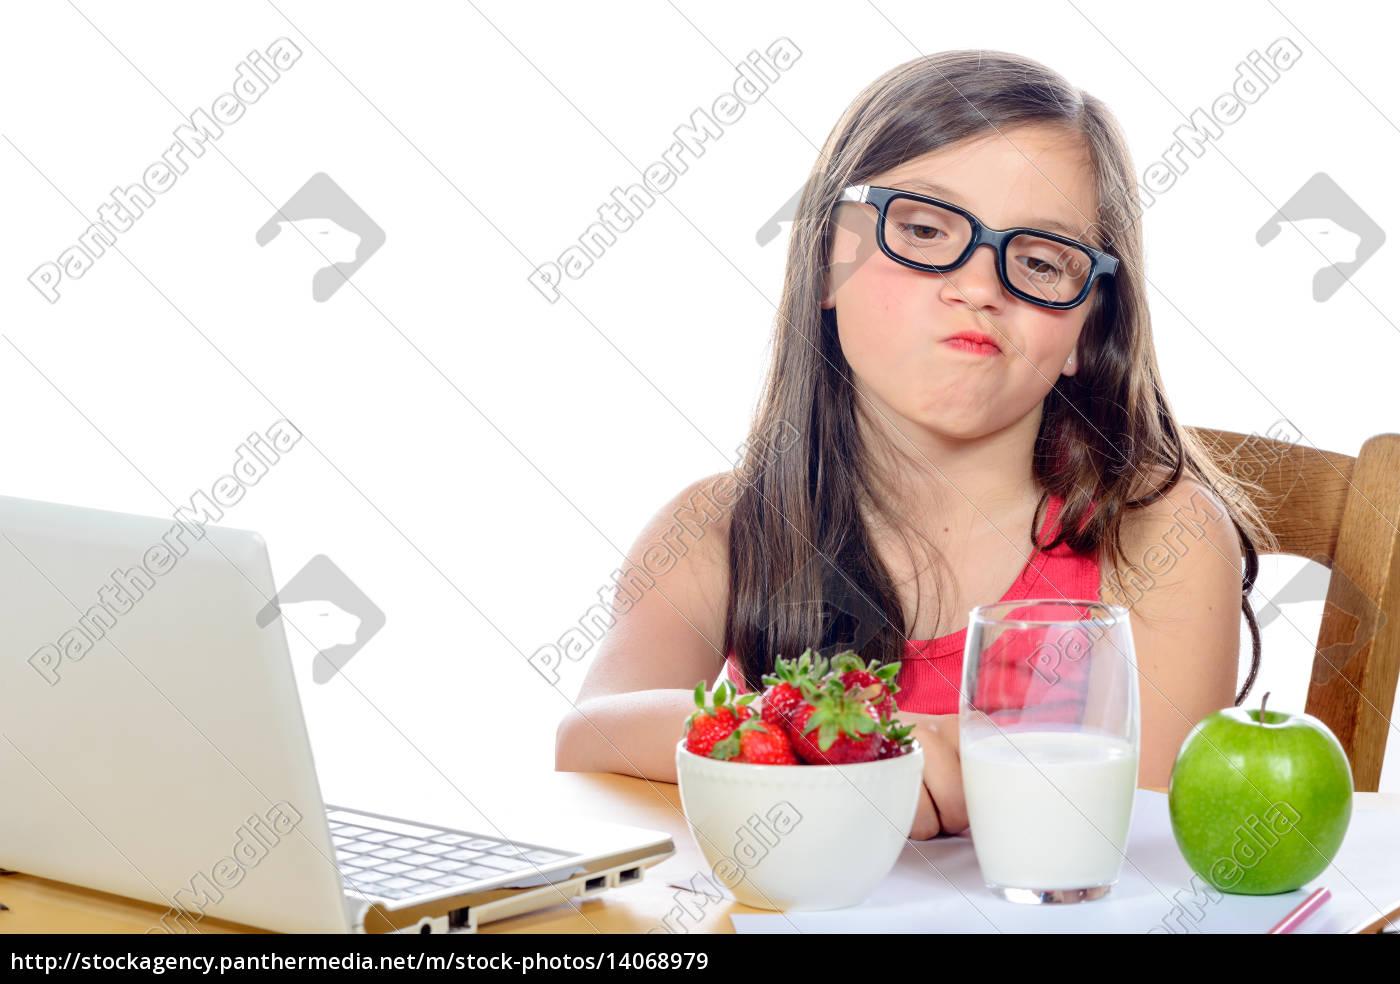 a, little, girl, at, her, desk - 14068979